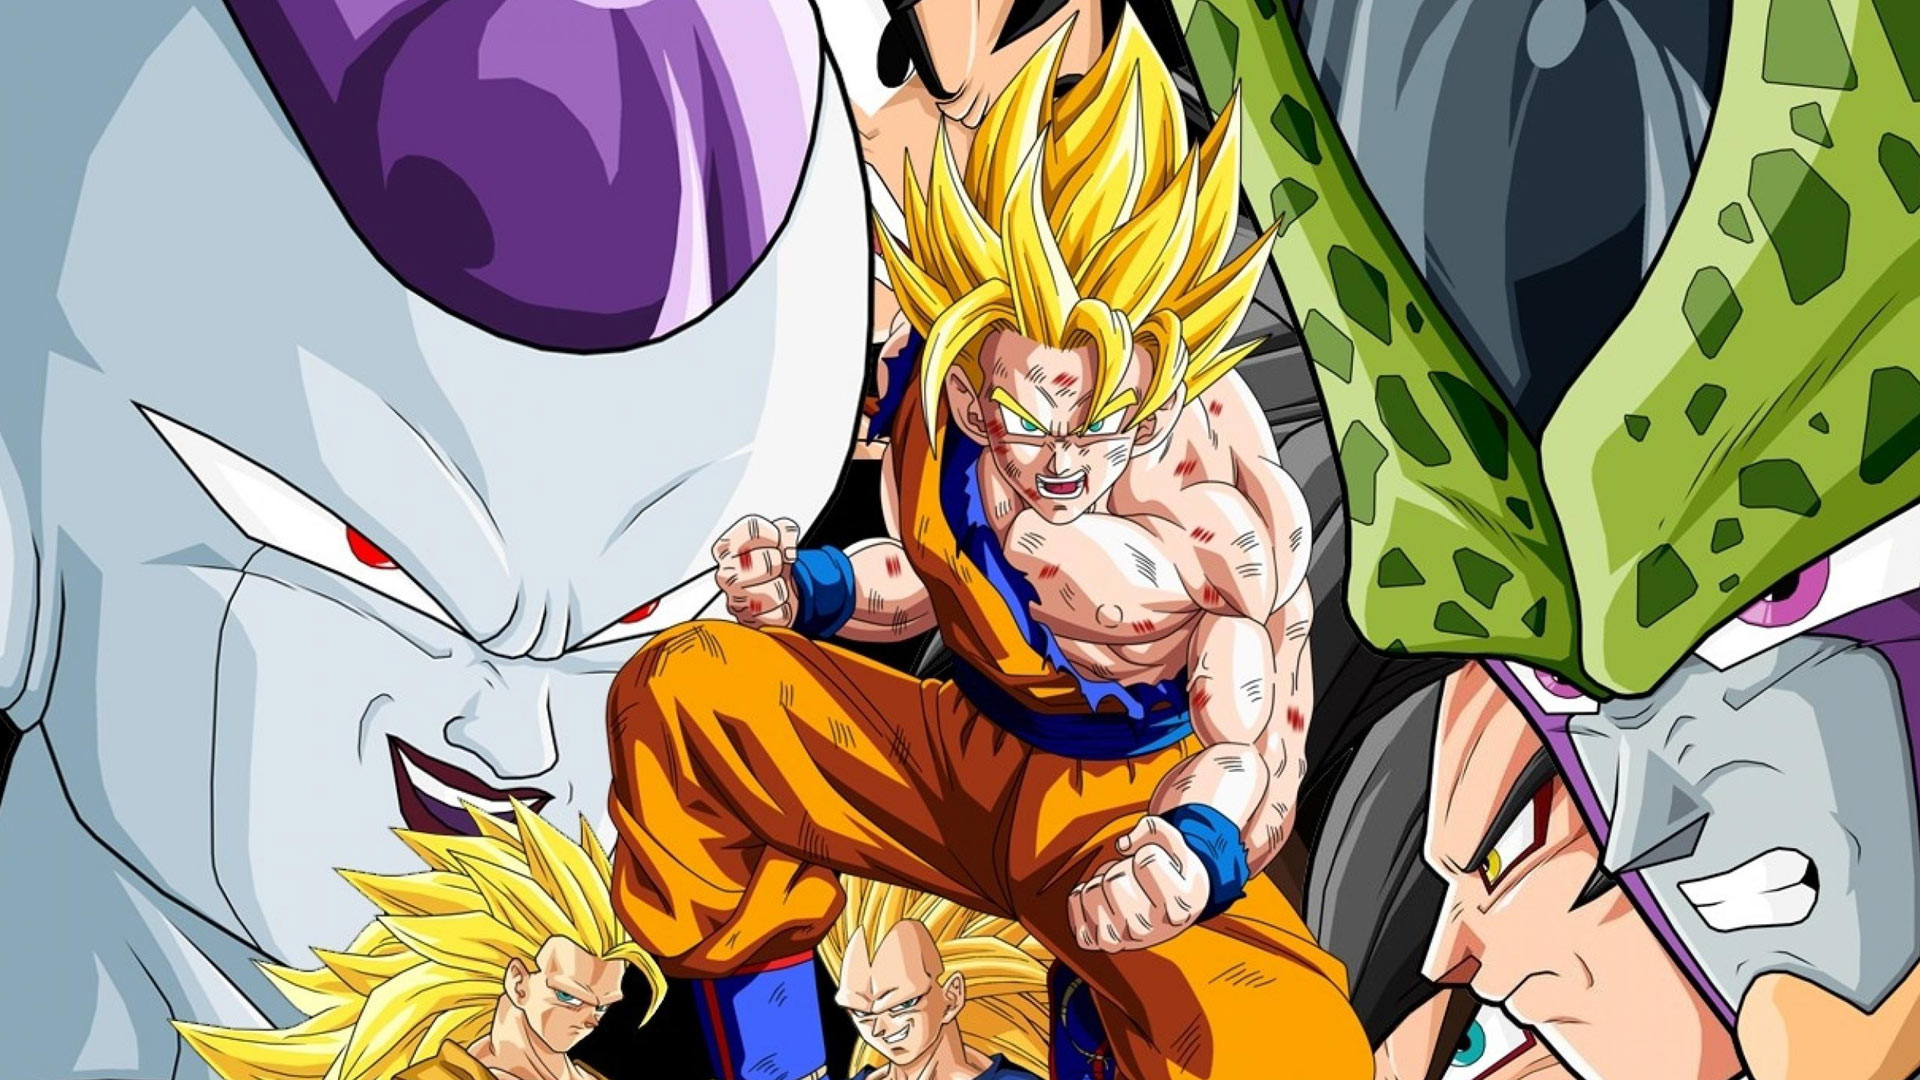 … Download Free Goku Dragon Ball Z Wallpapers HD Wallpapers .